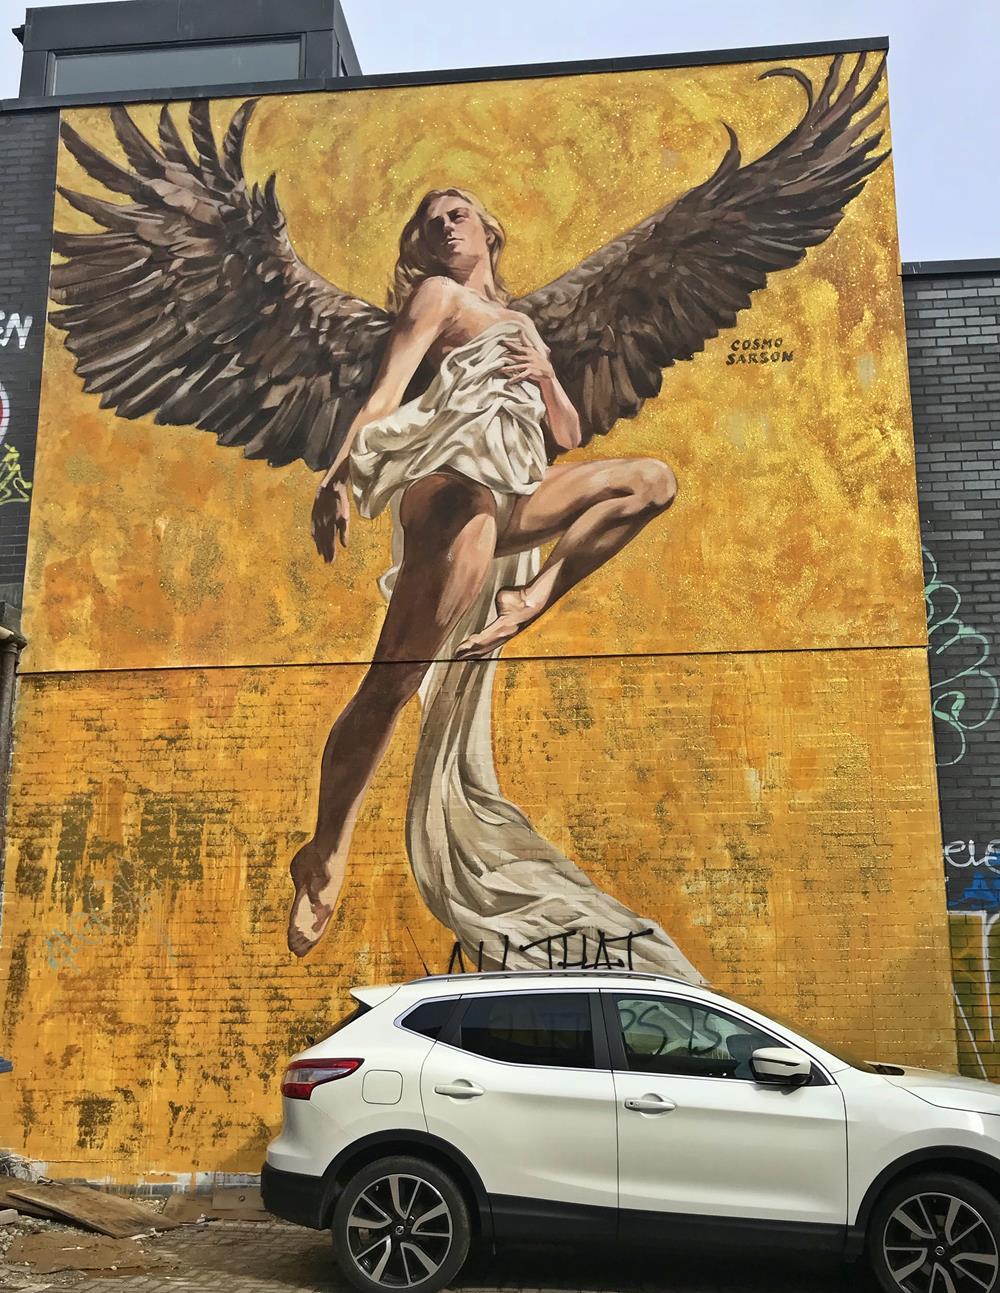 Cosmo Sarson's handpainted Angel of Brighton